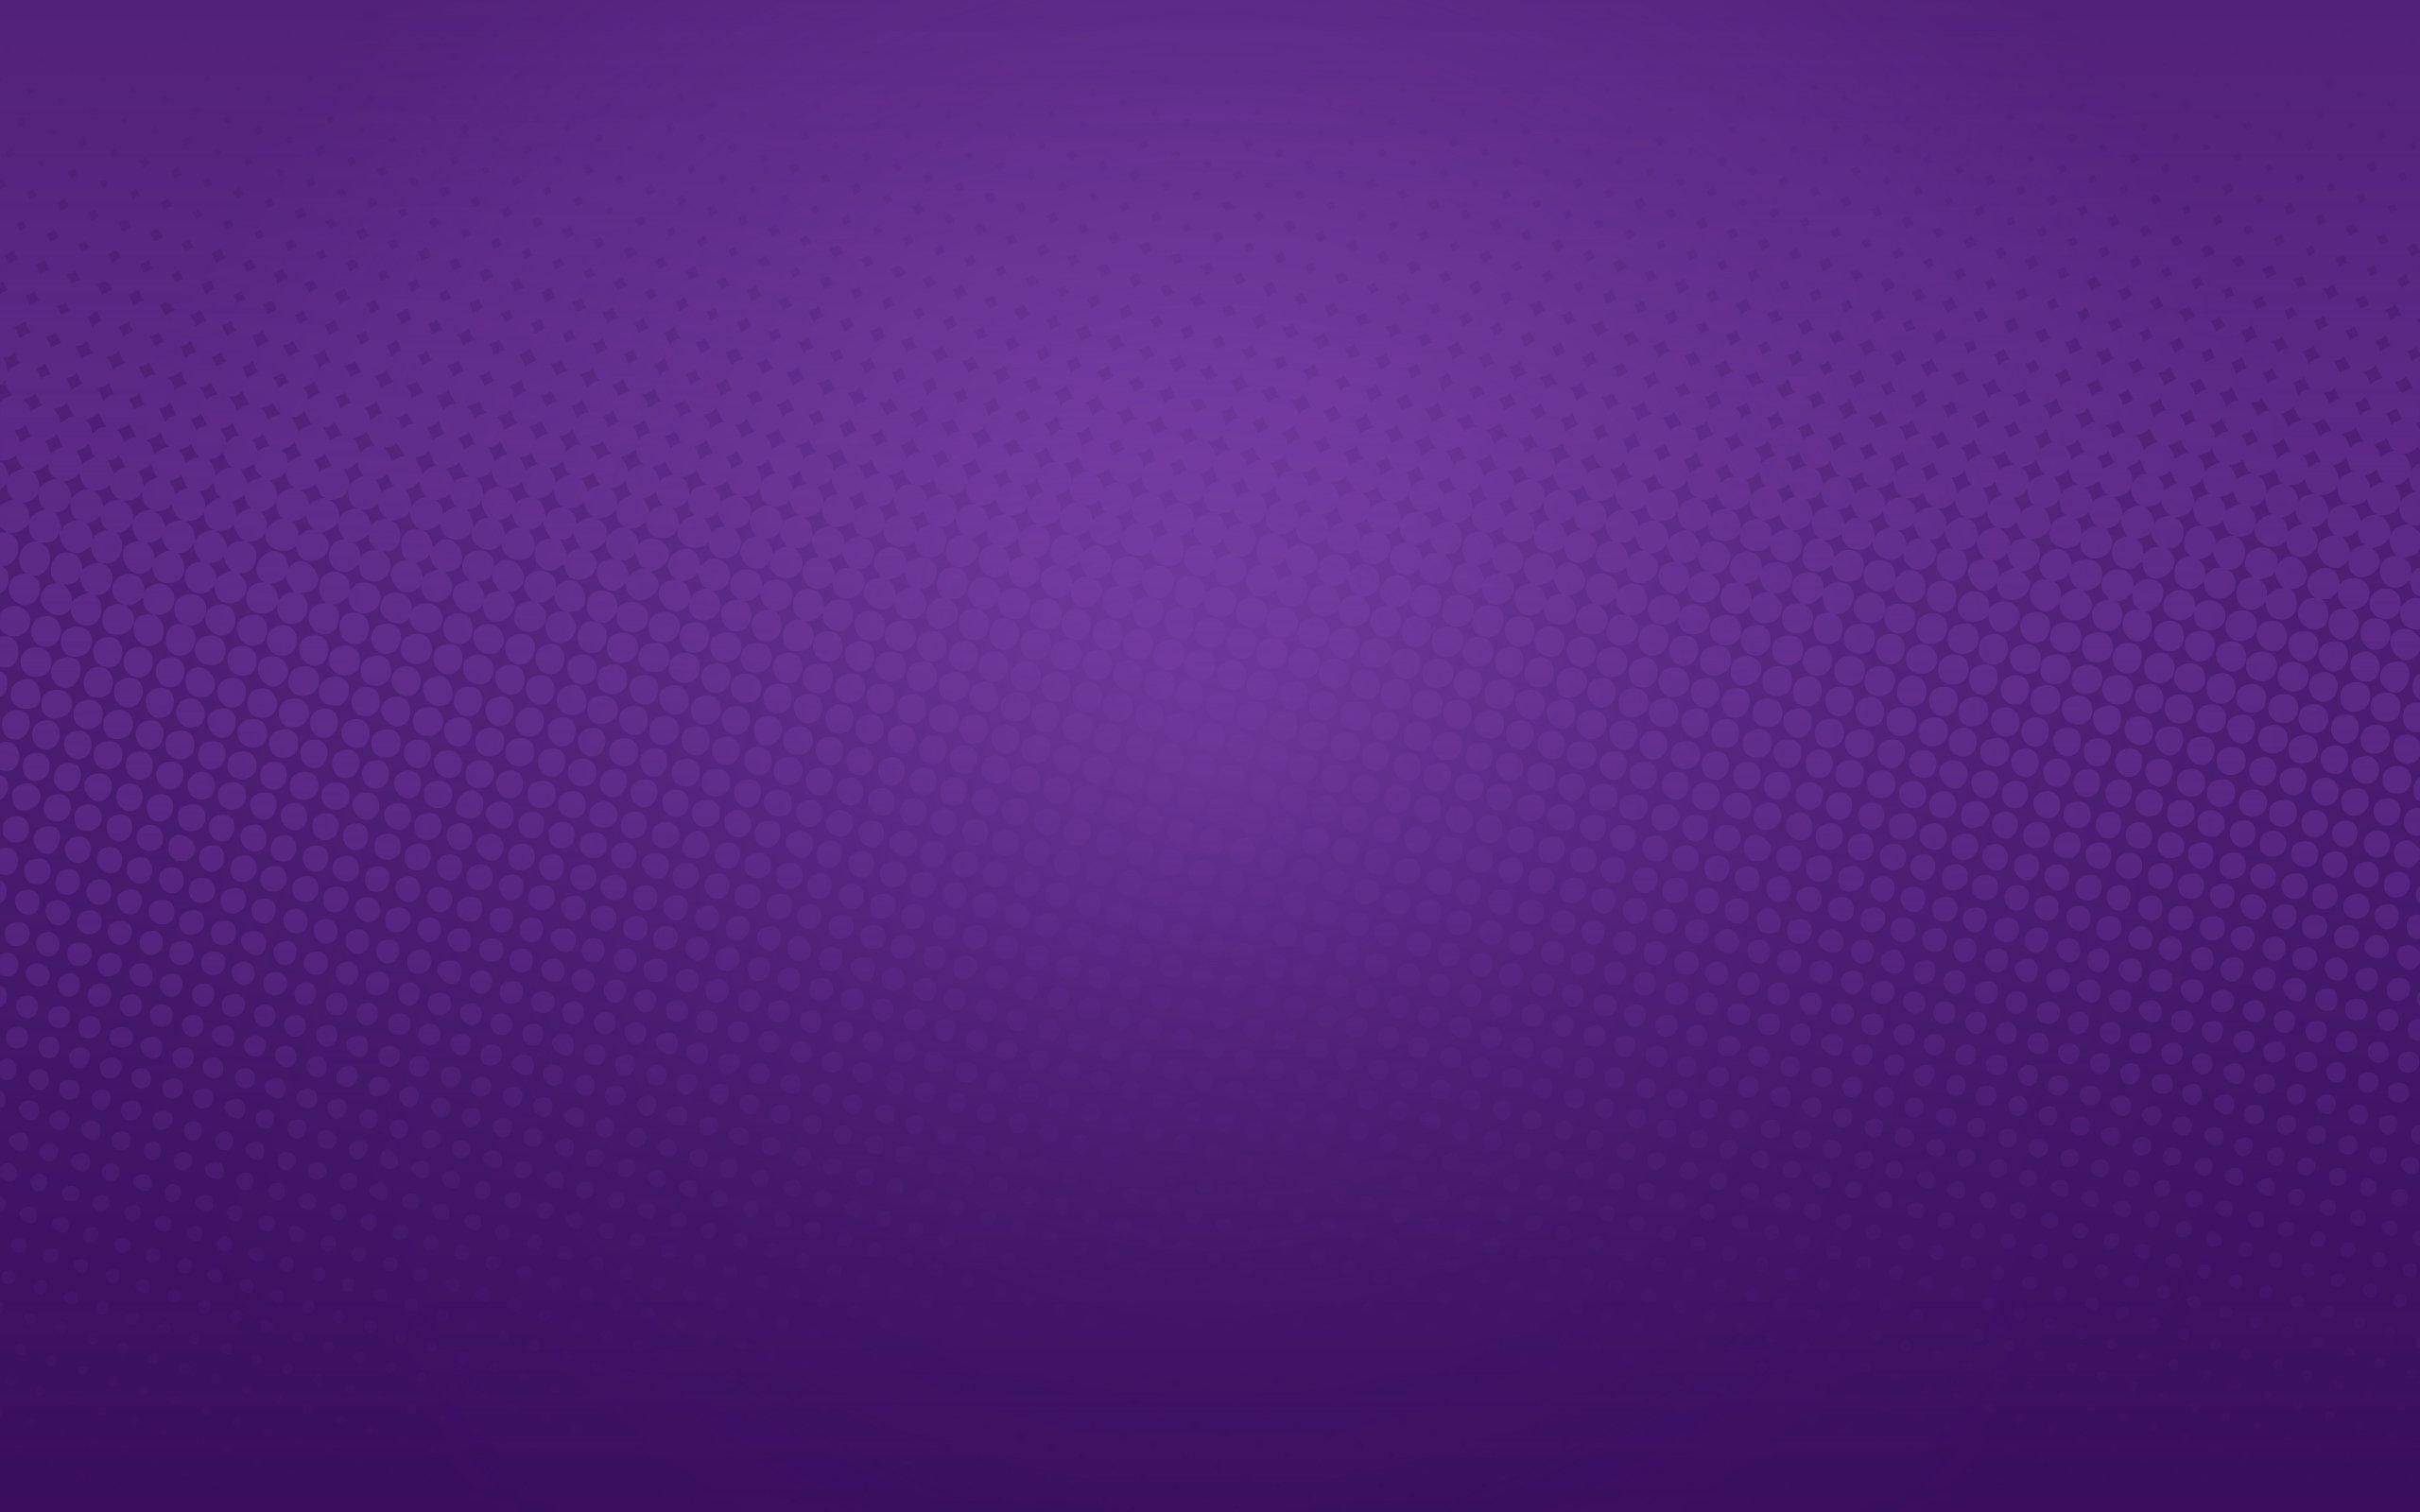 Purple wallpaper 5 2560x1600